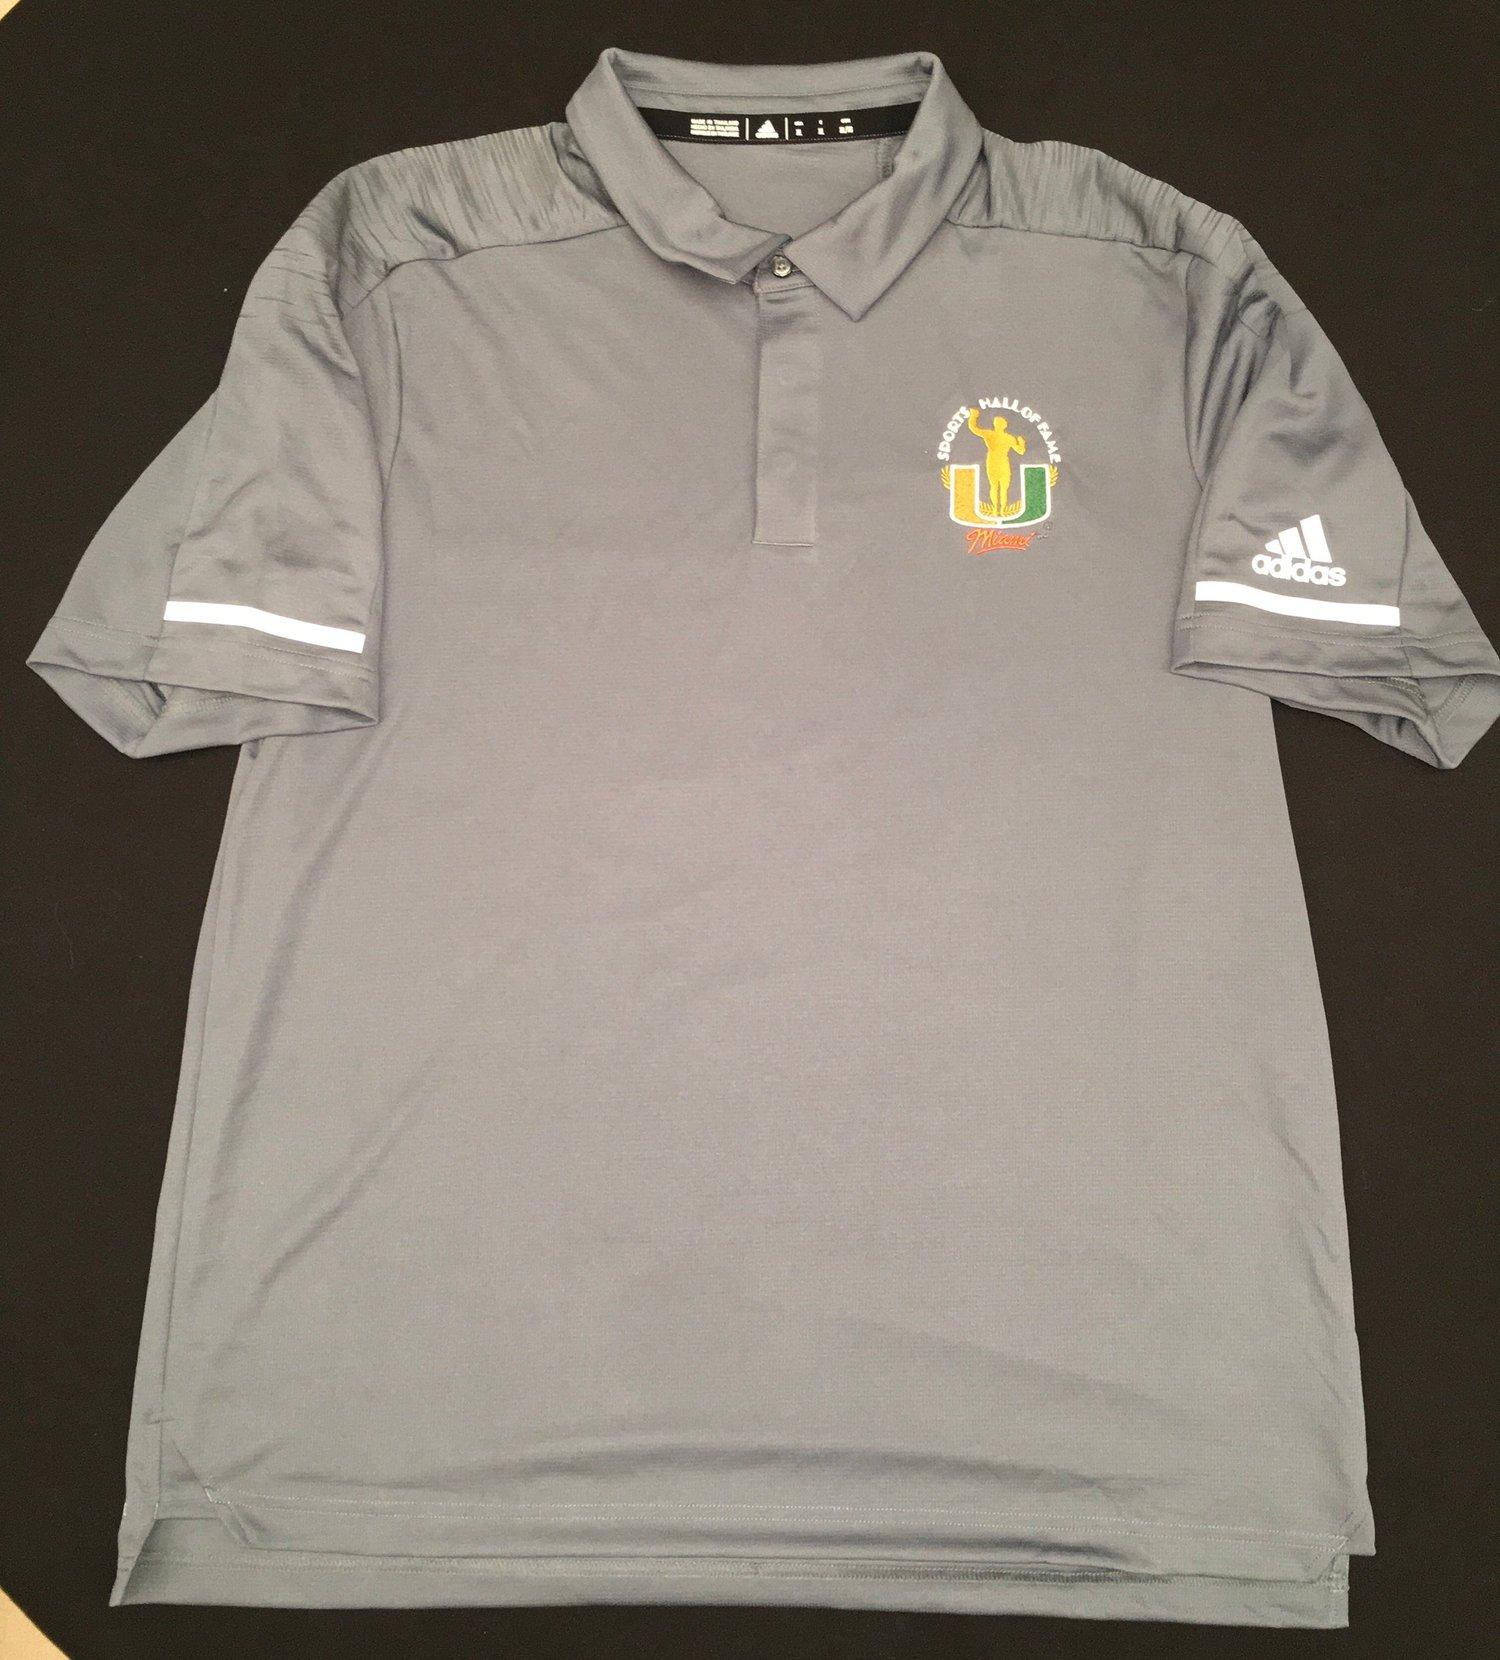 Image of Men's Grey Addidas Golf Polo Shirt